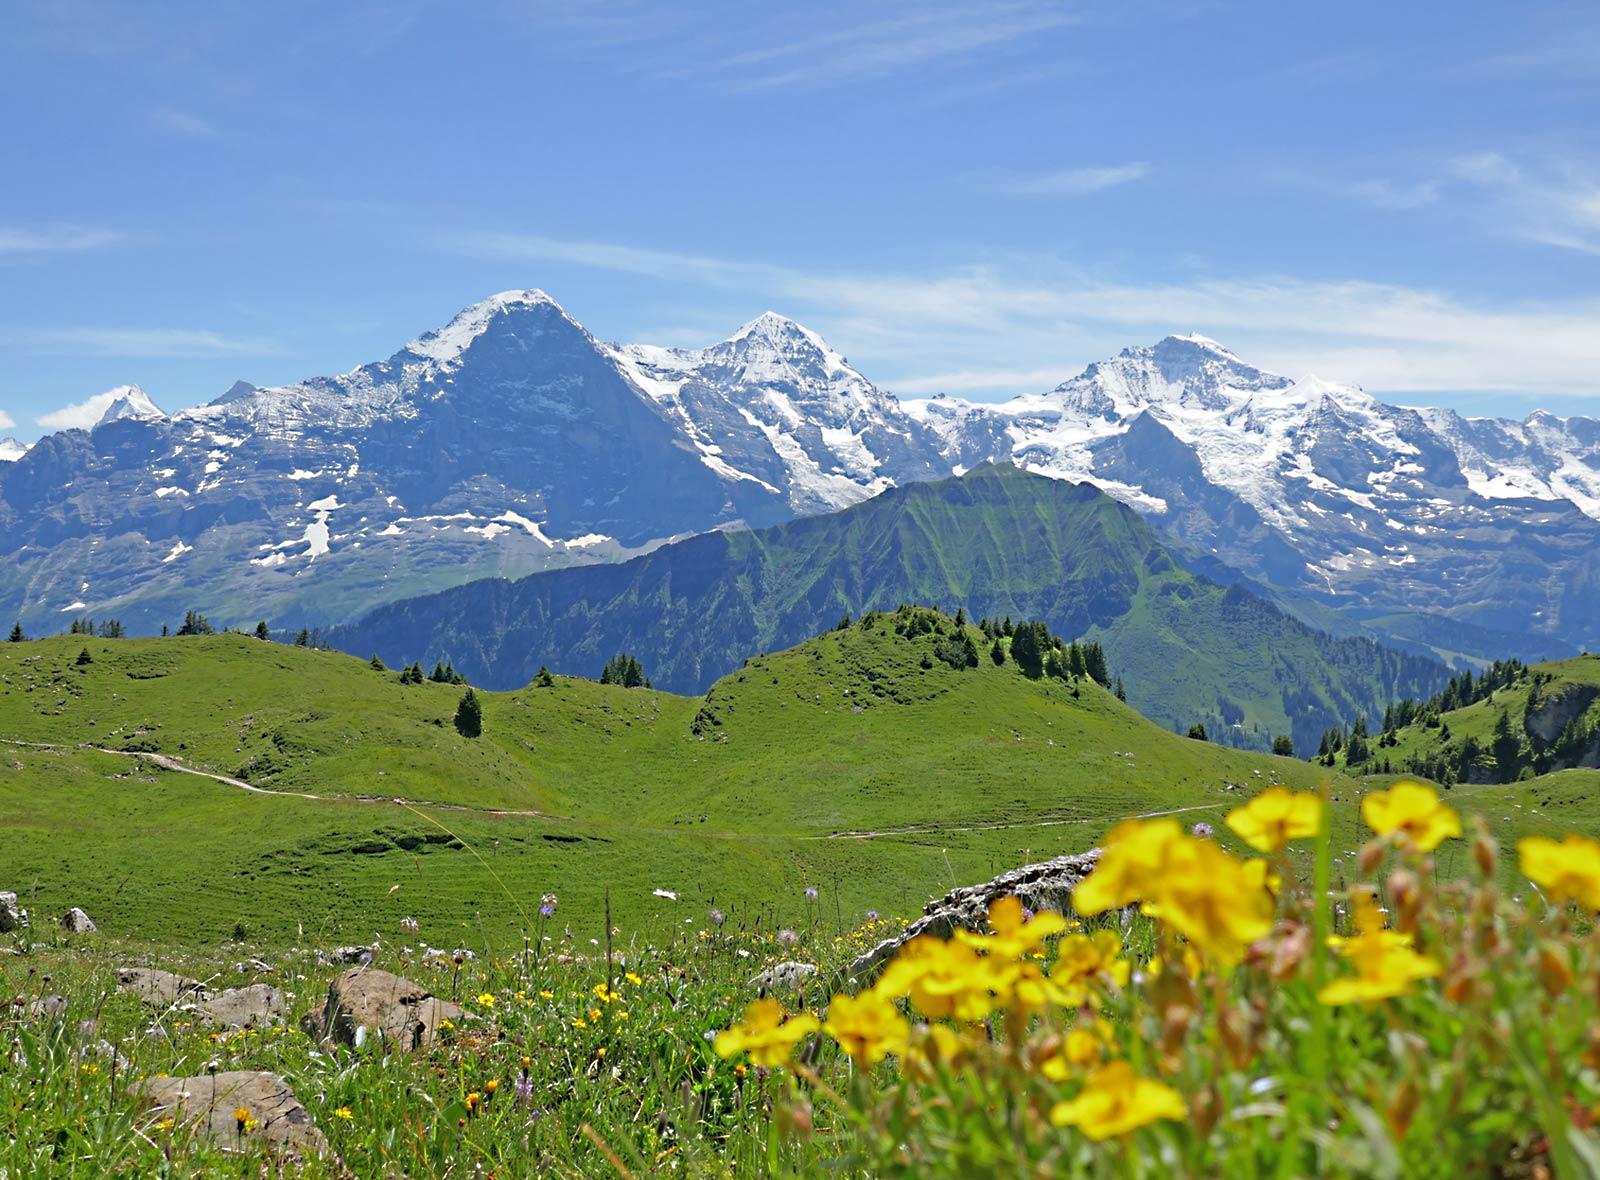 4000er in der Schweiz Finsteraarhorn, Fiescherhorn, Eiger, Mönch, Jungfrau